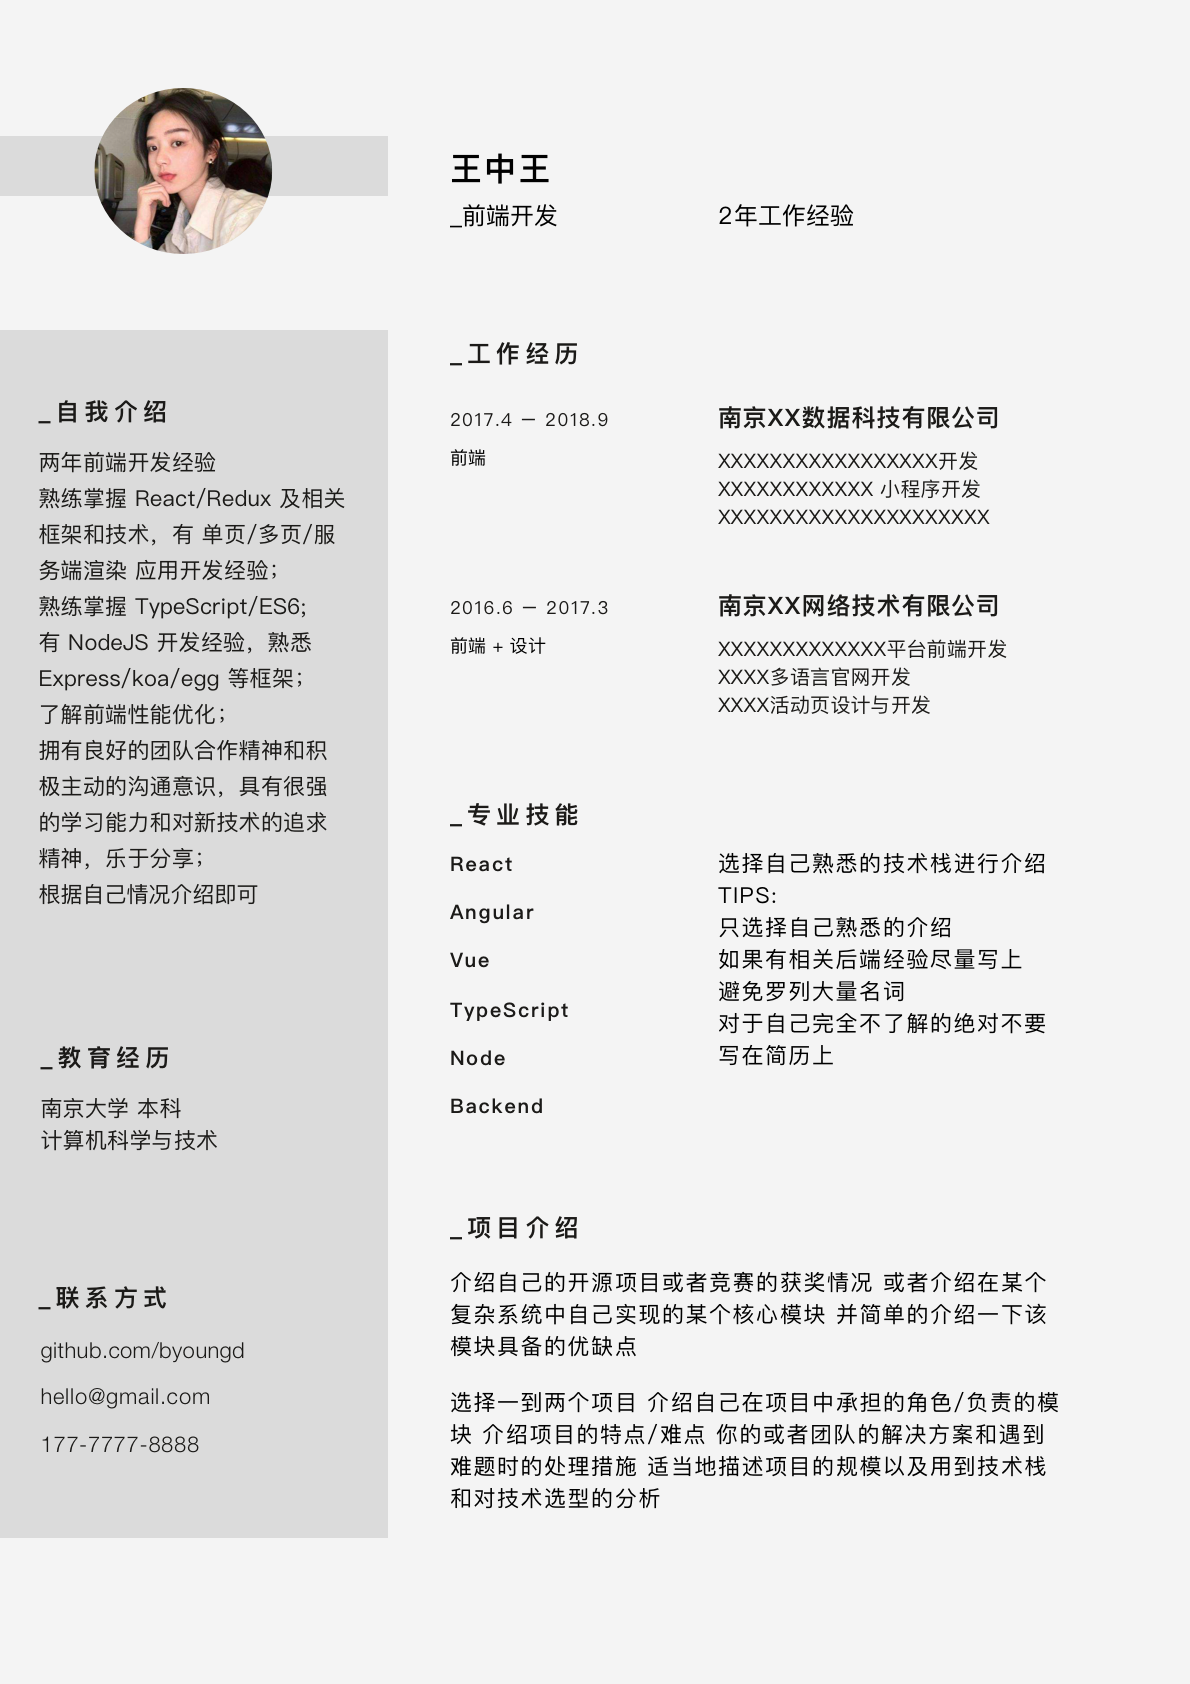 Resume-byoungd-2019